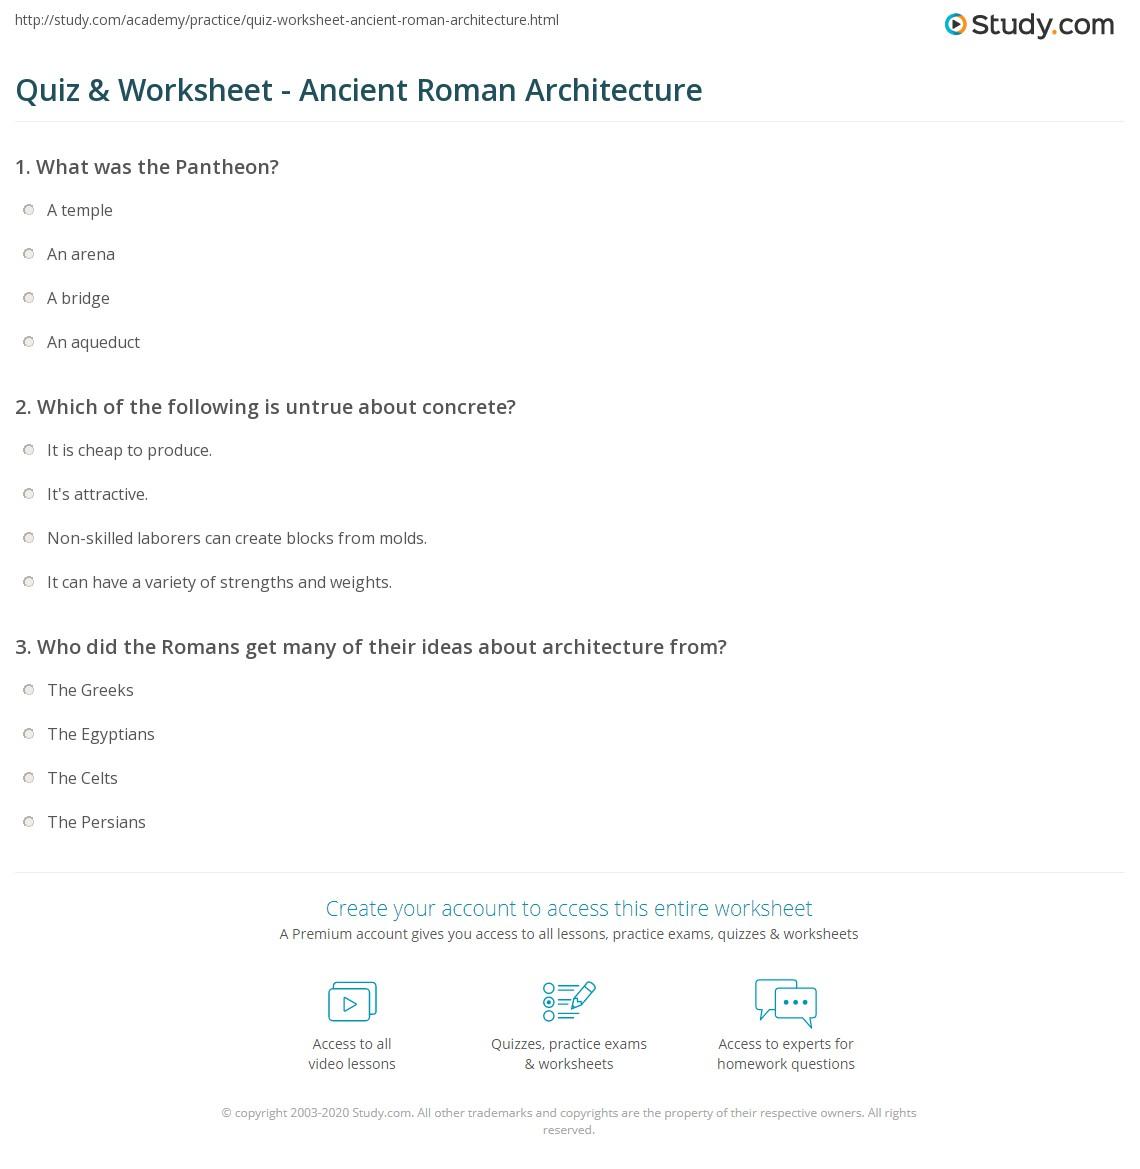 quiz worksheet ancient roman architecture. Black Bedroom Furniture Sets. Home Design Ideas